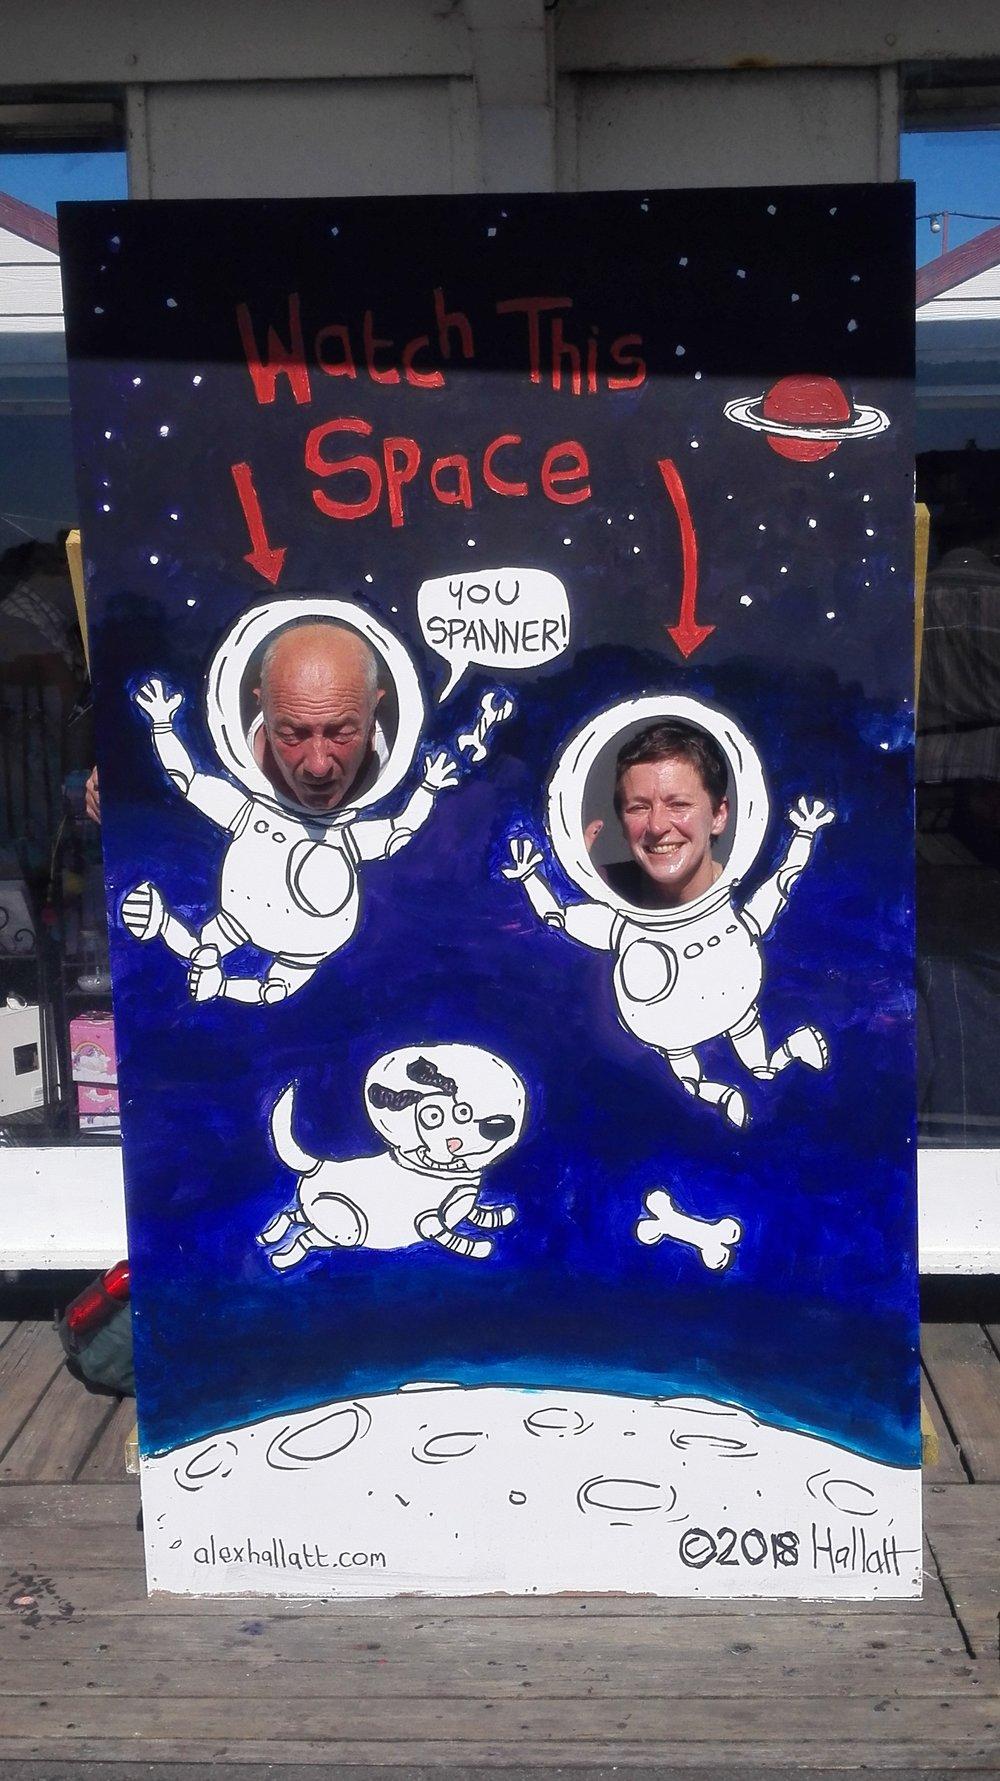 Herne-Bay-Watch-This-Space-Holey-Board.jpg